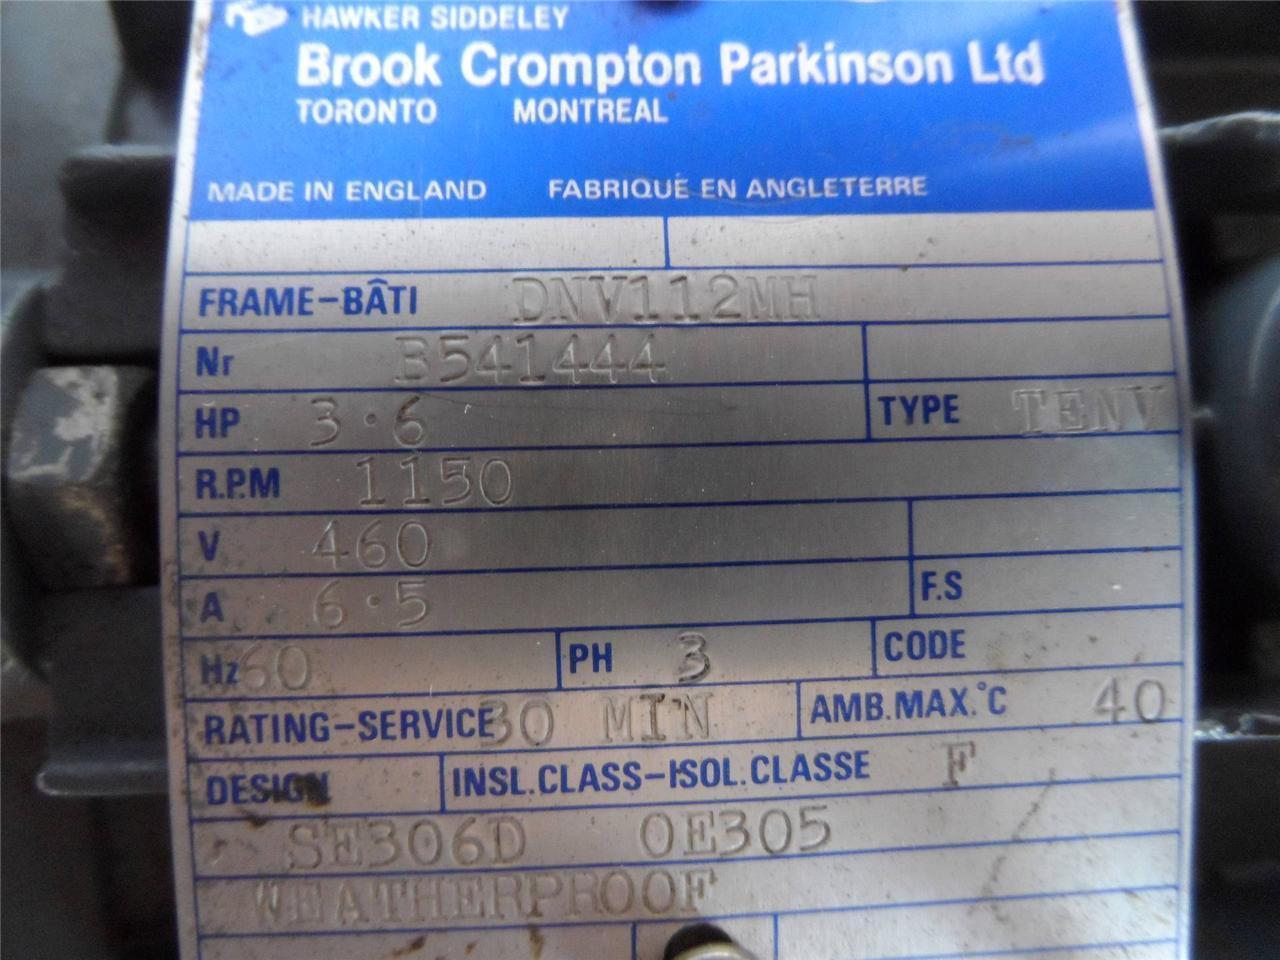 Hawker Siddeley 3.6HP, 460V, 3Ph Motor 1150 RPM Brook Crompton Parkinson LTD.